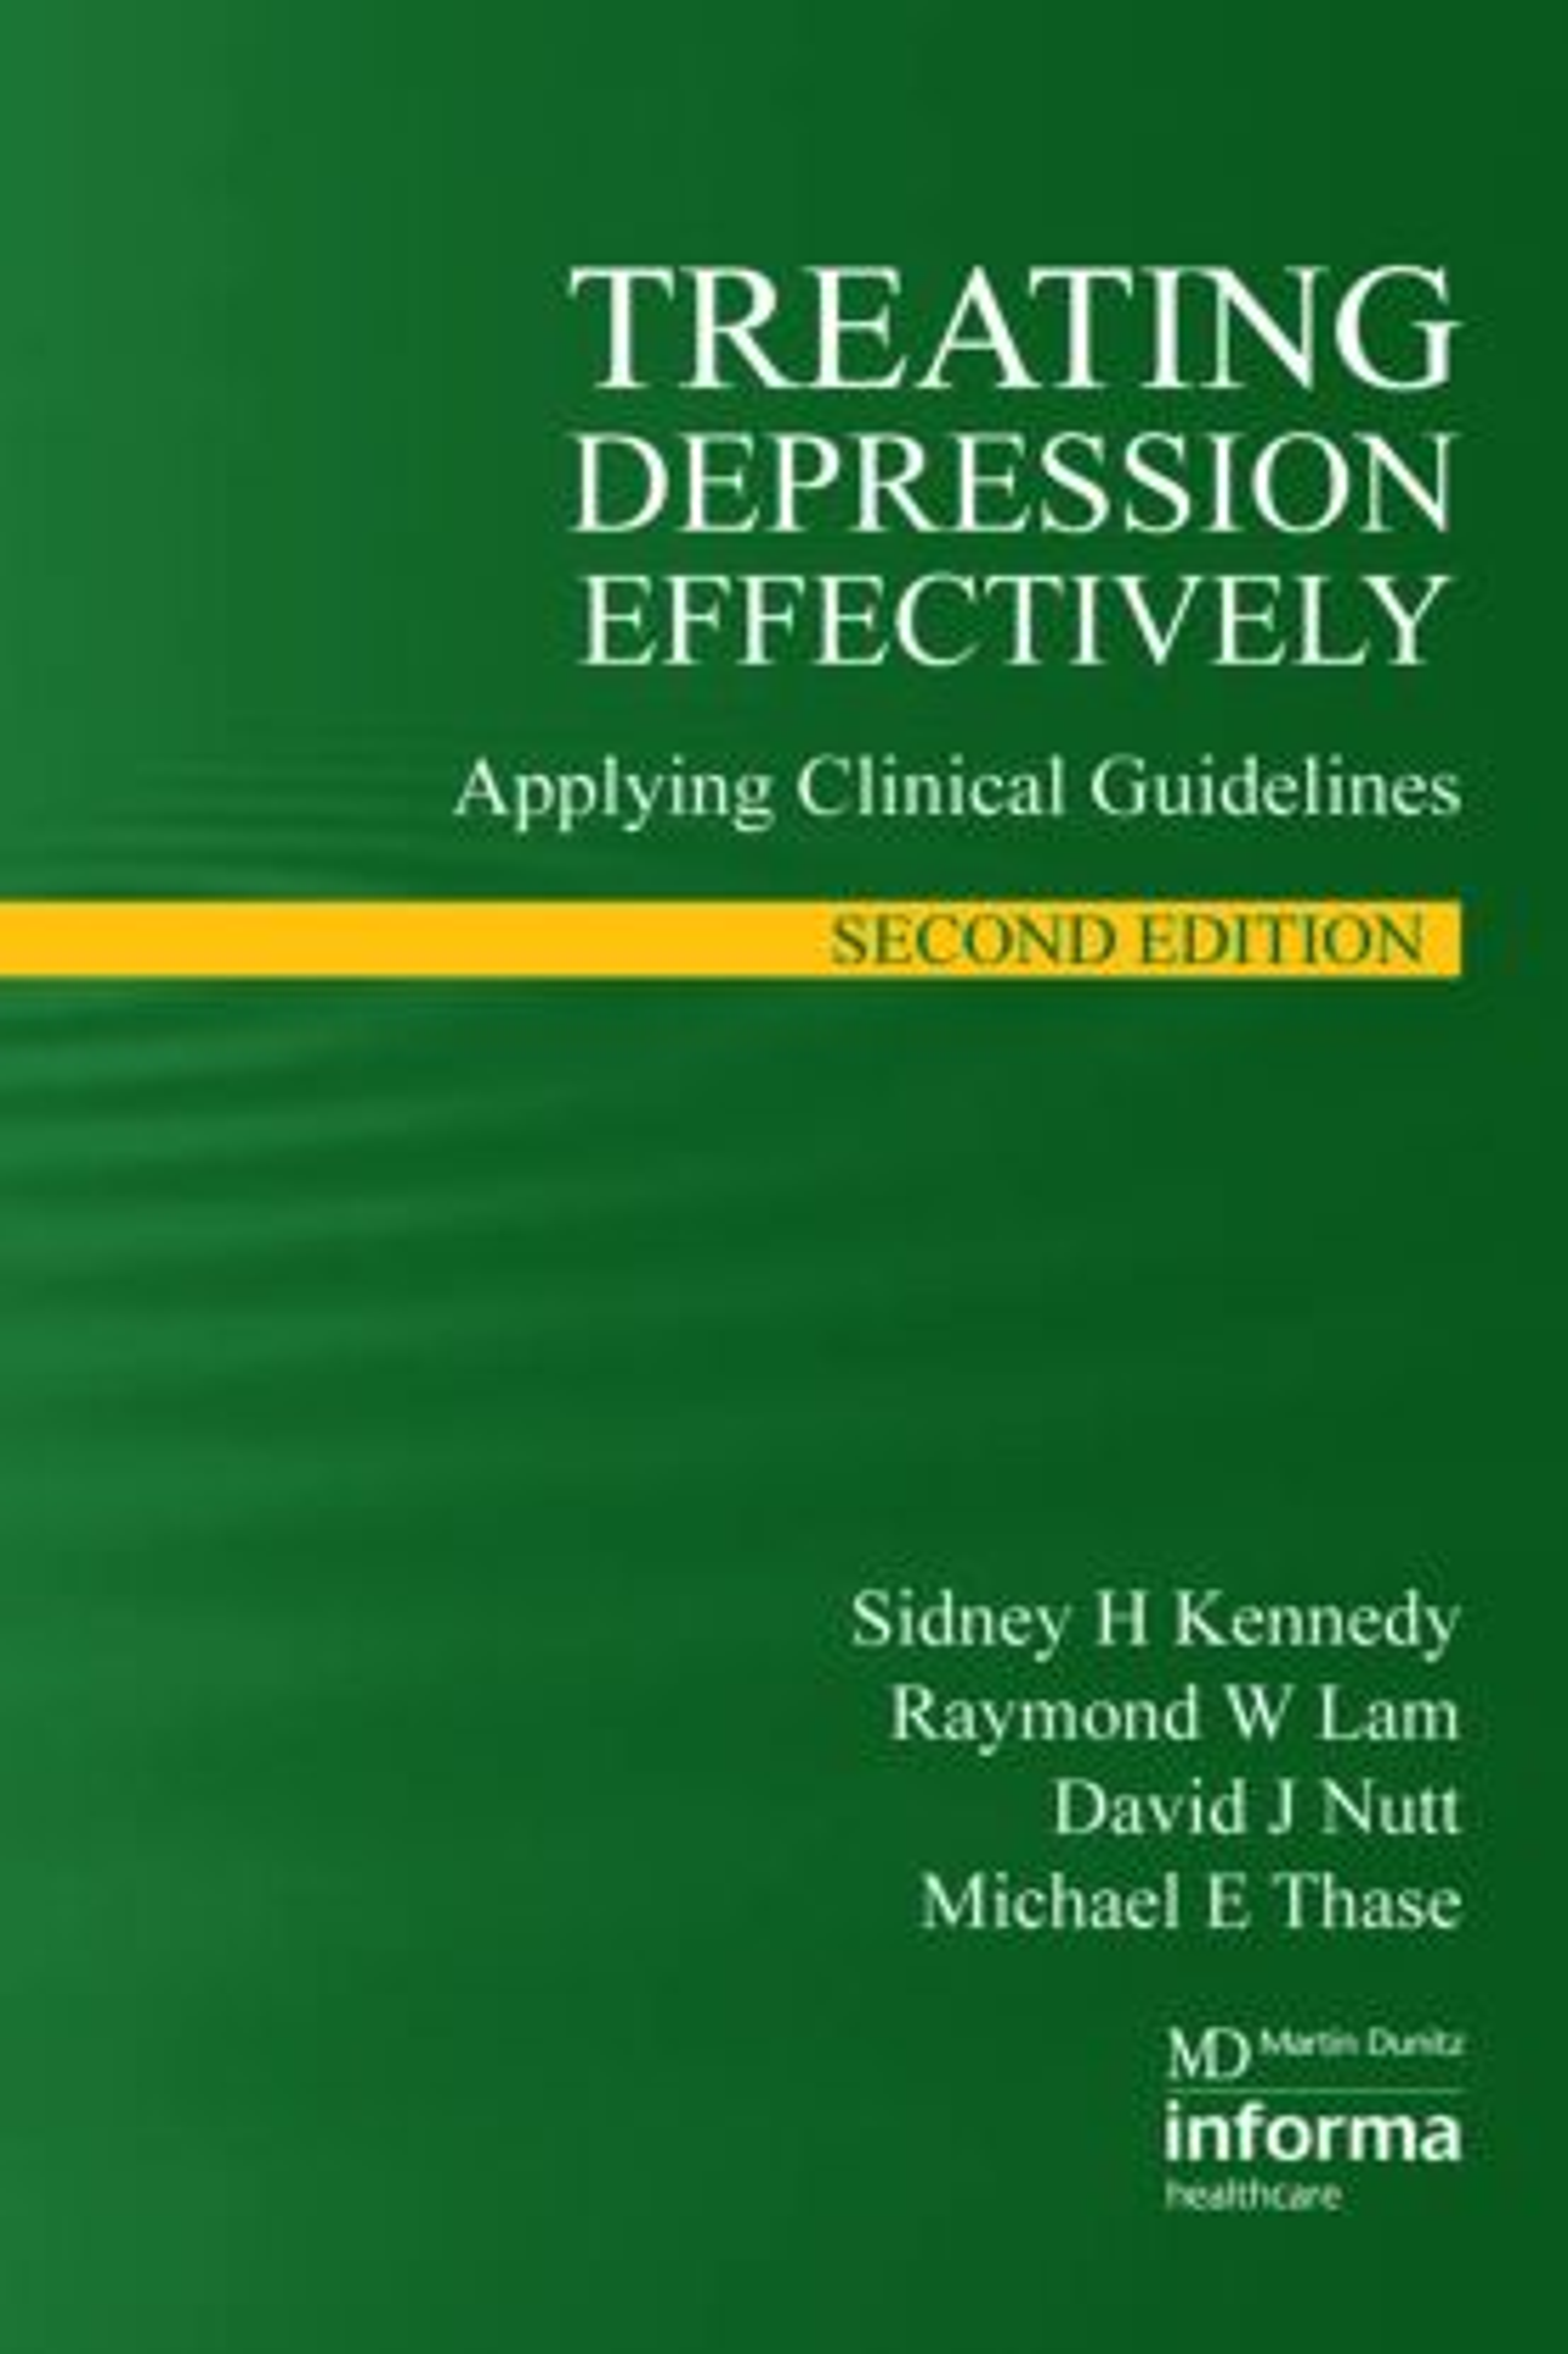 Treating Depression Effectively